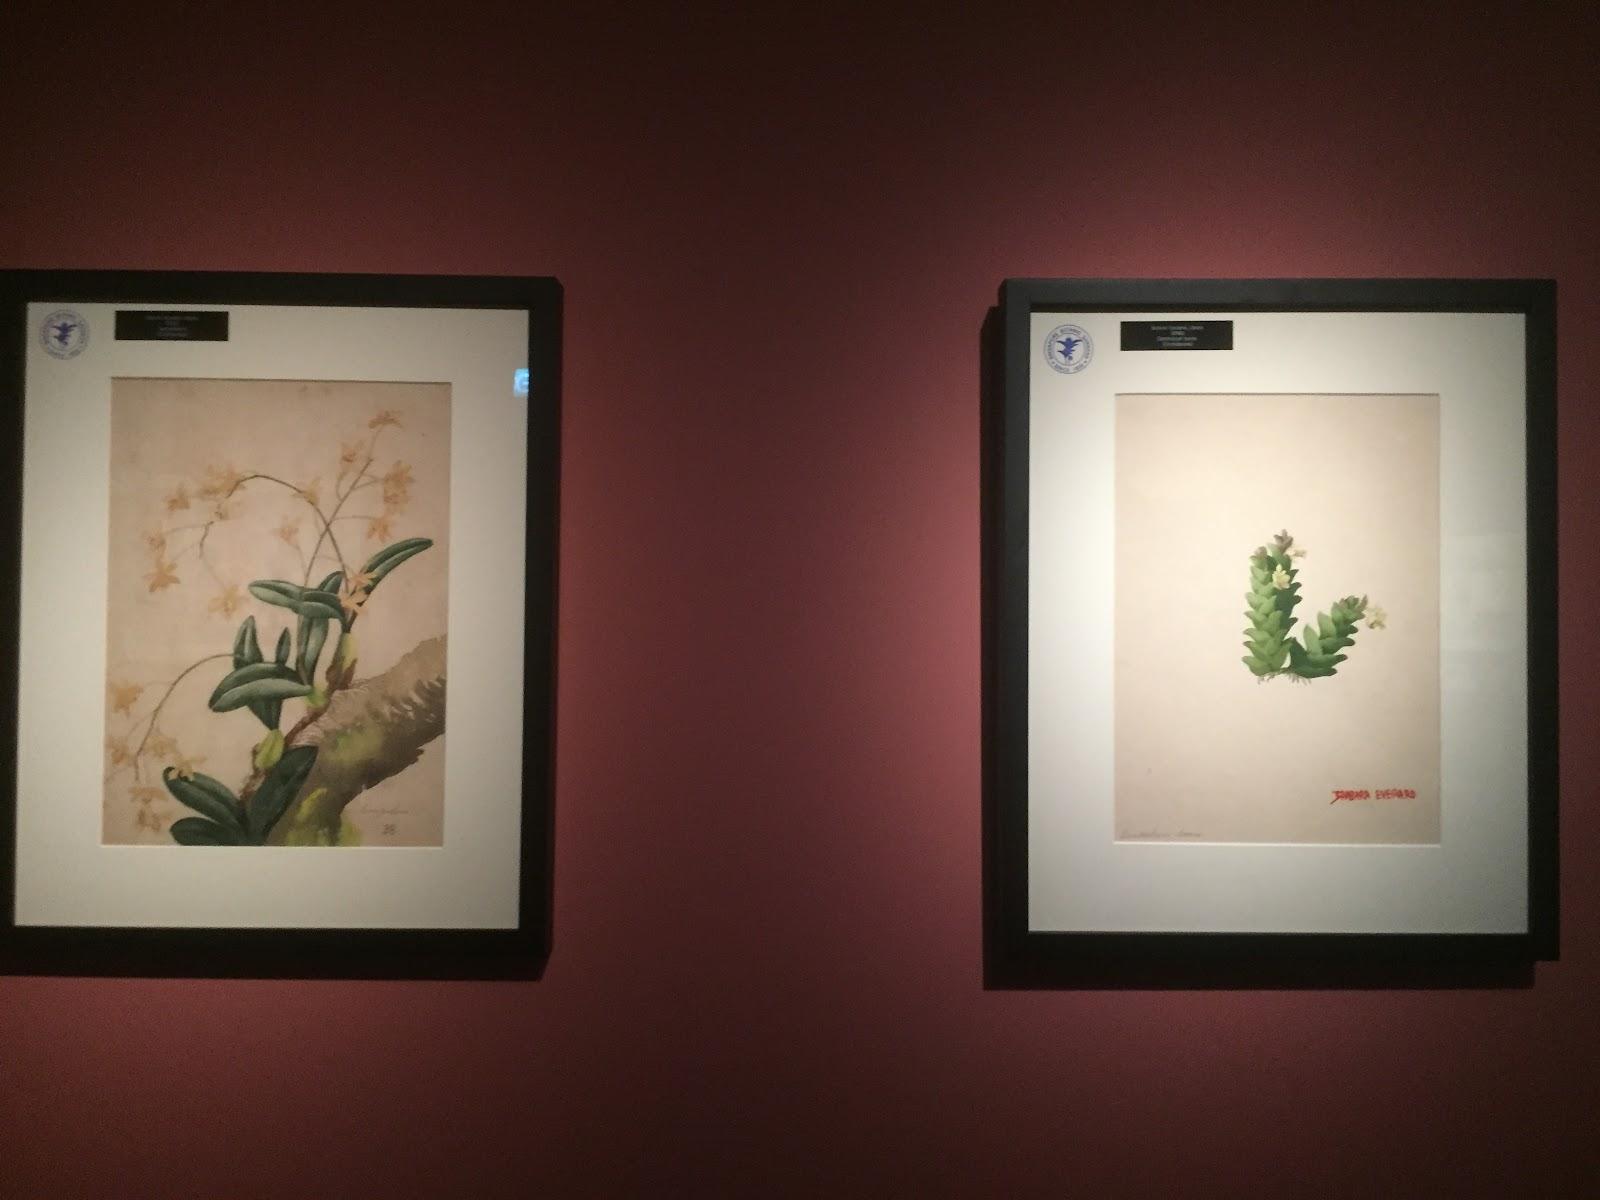 More botanical paintings on display